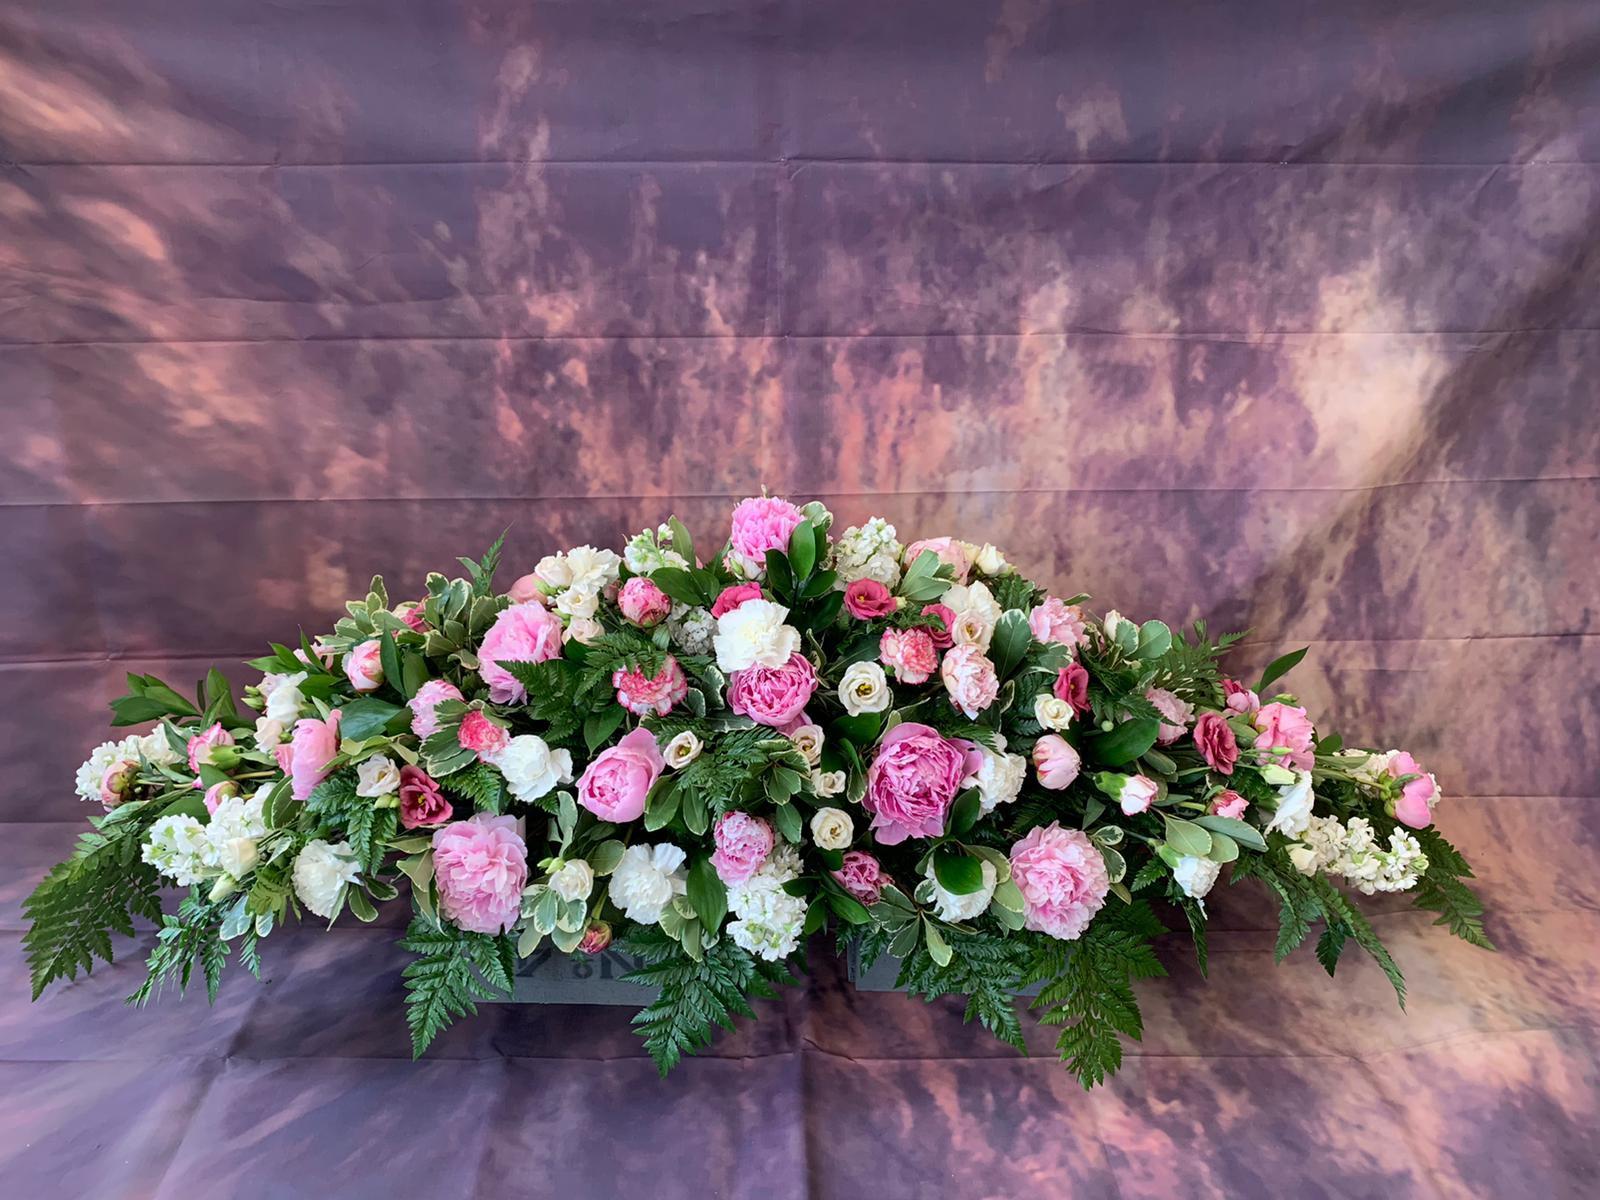 Funeral Coffin Spray 002